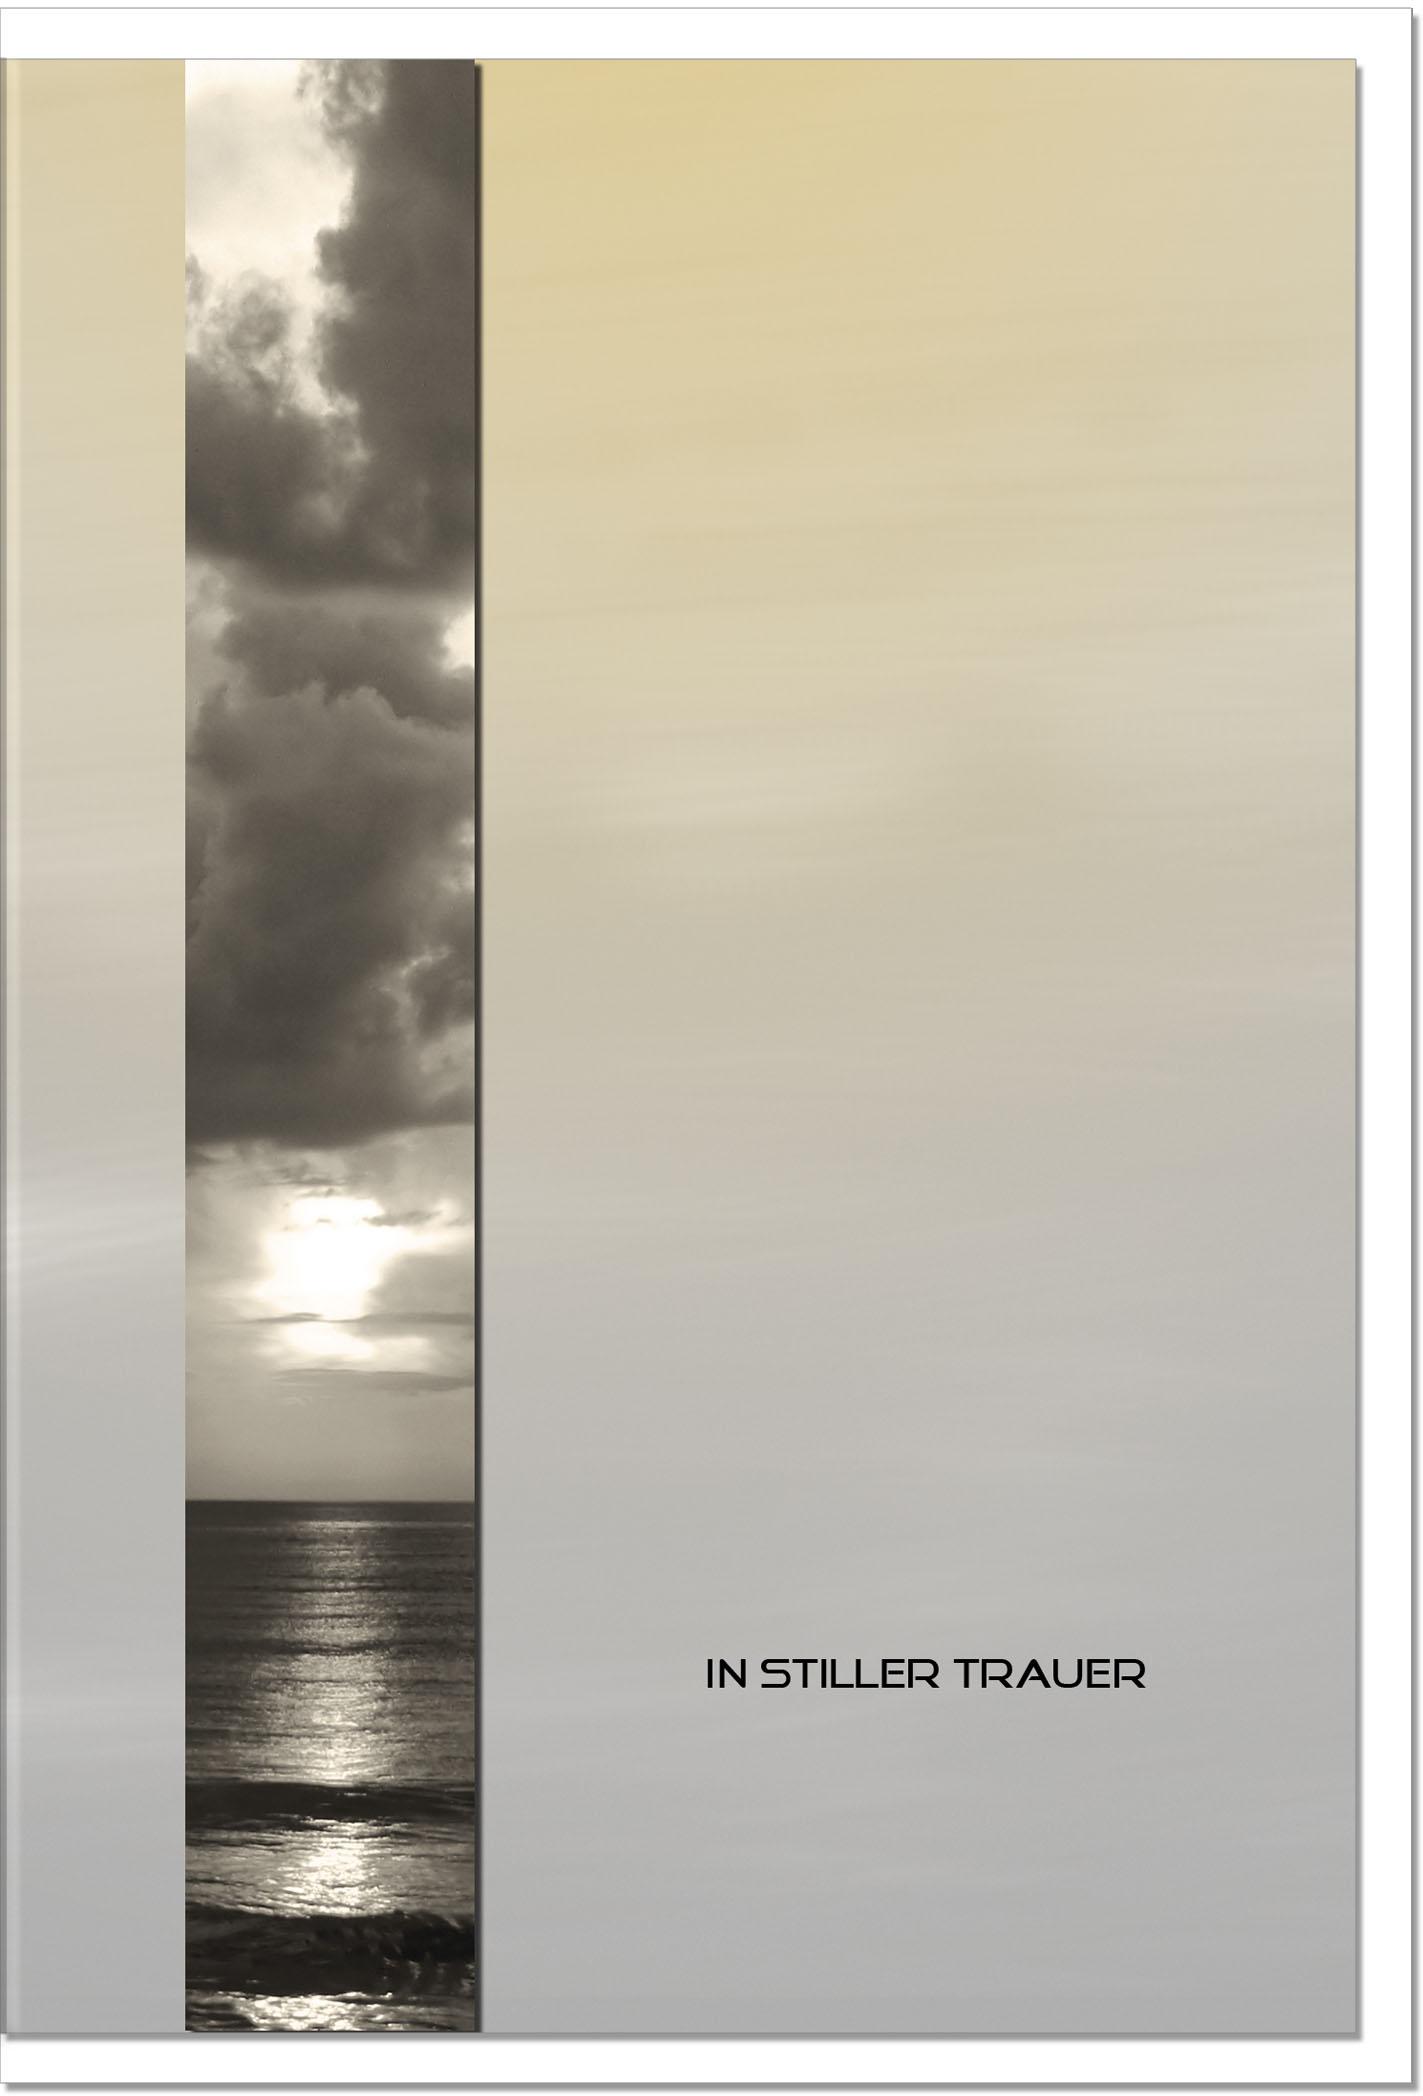 Trauerkarte Beileidskarte / See